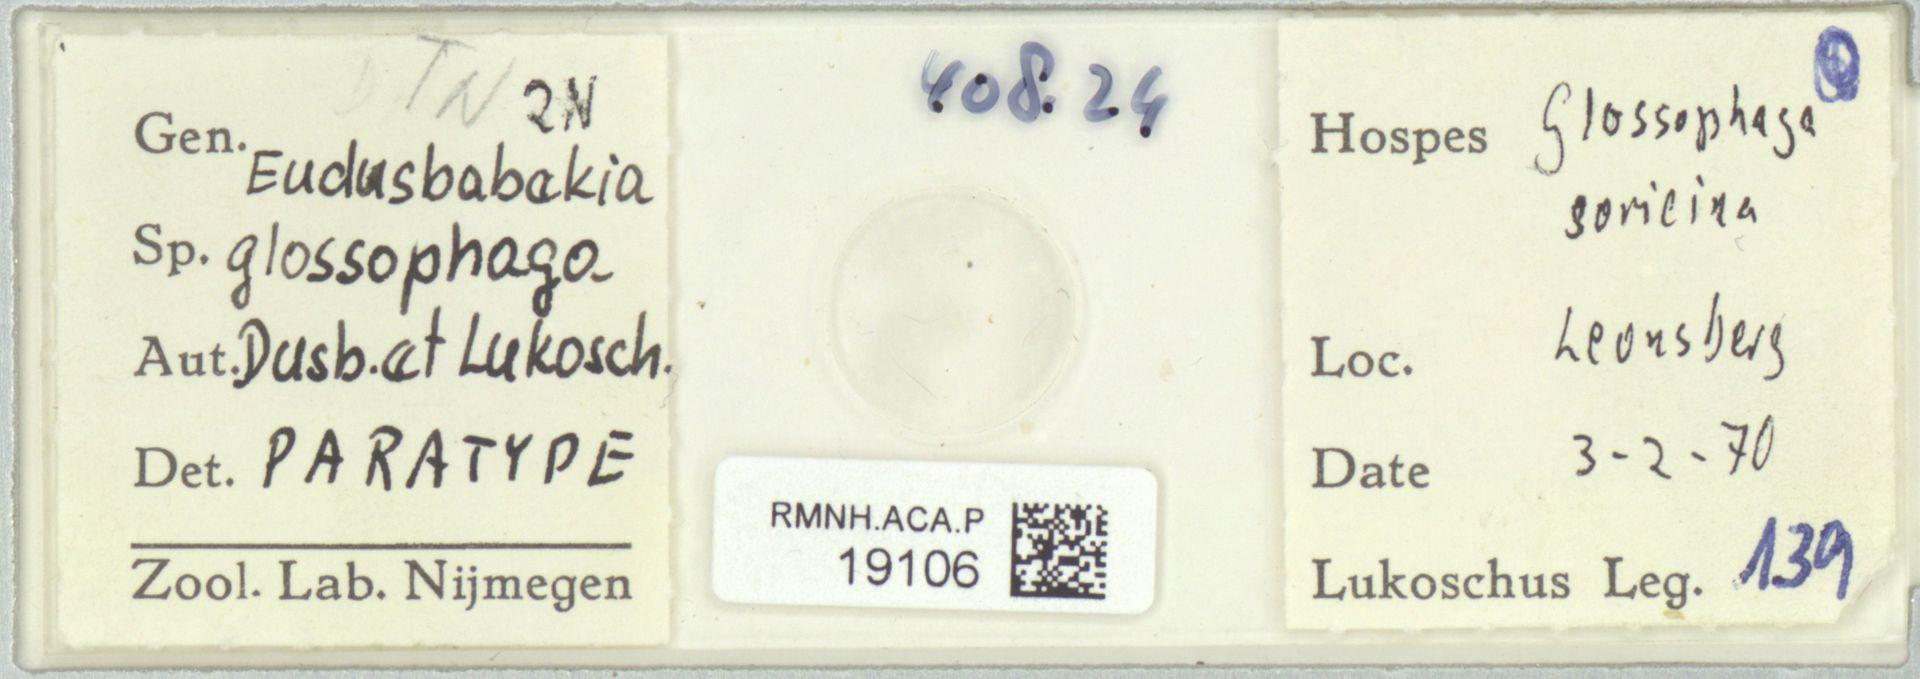 RMNH.ACA.P.19106 | Eudusbabekia glossophaga